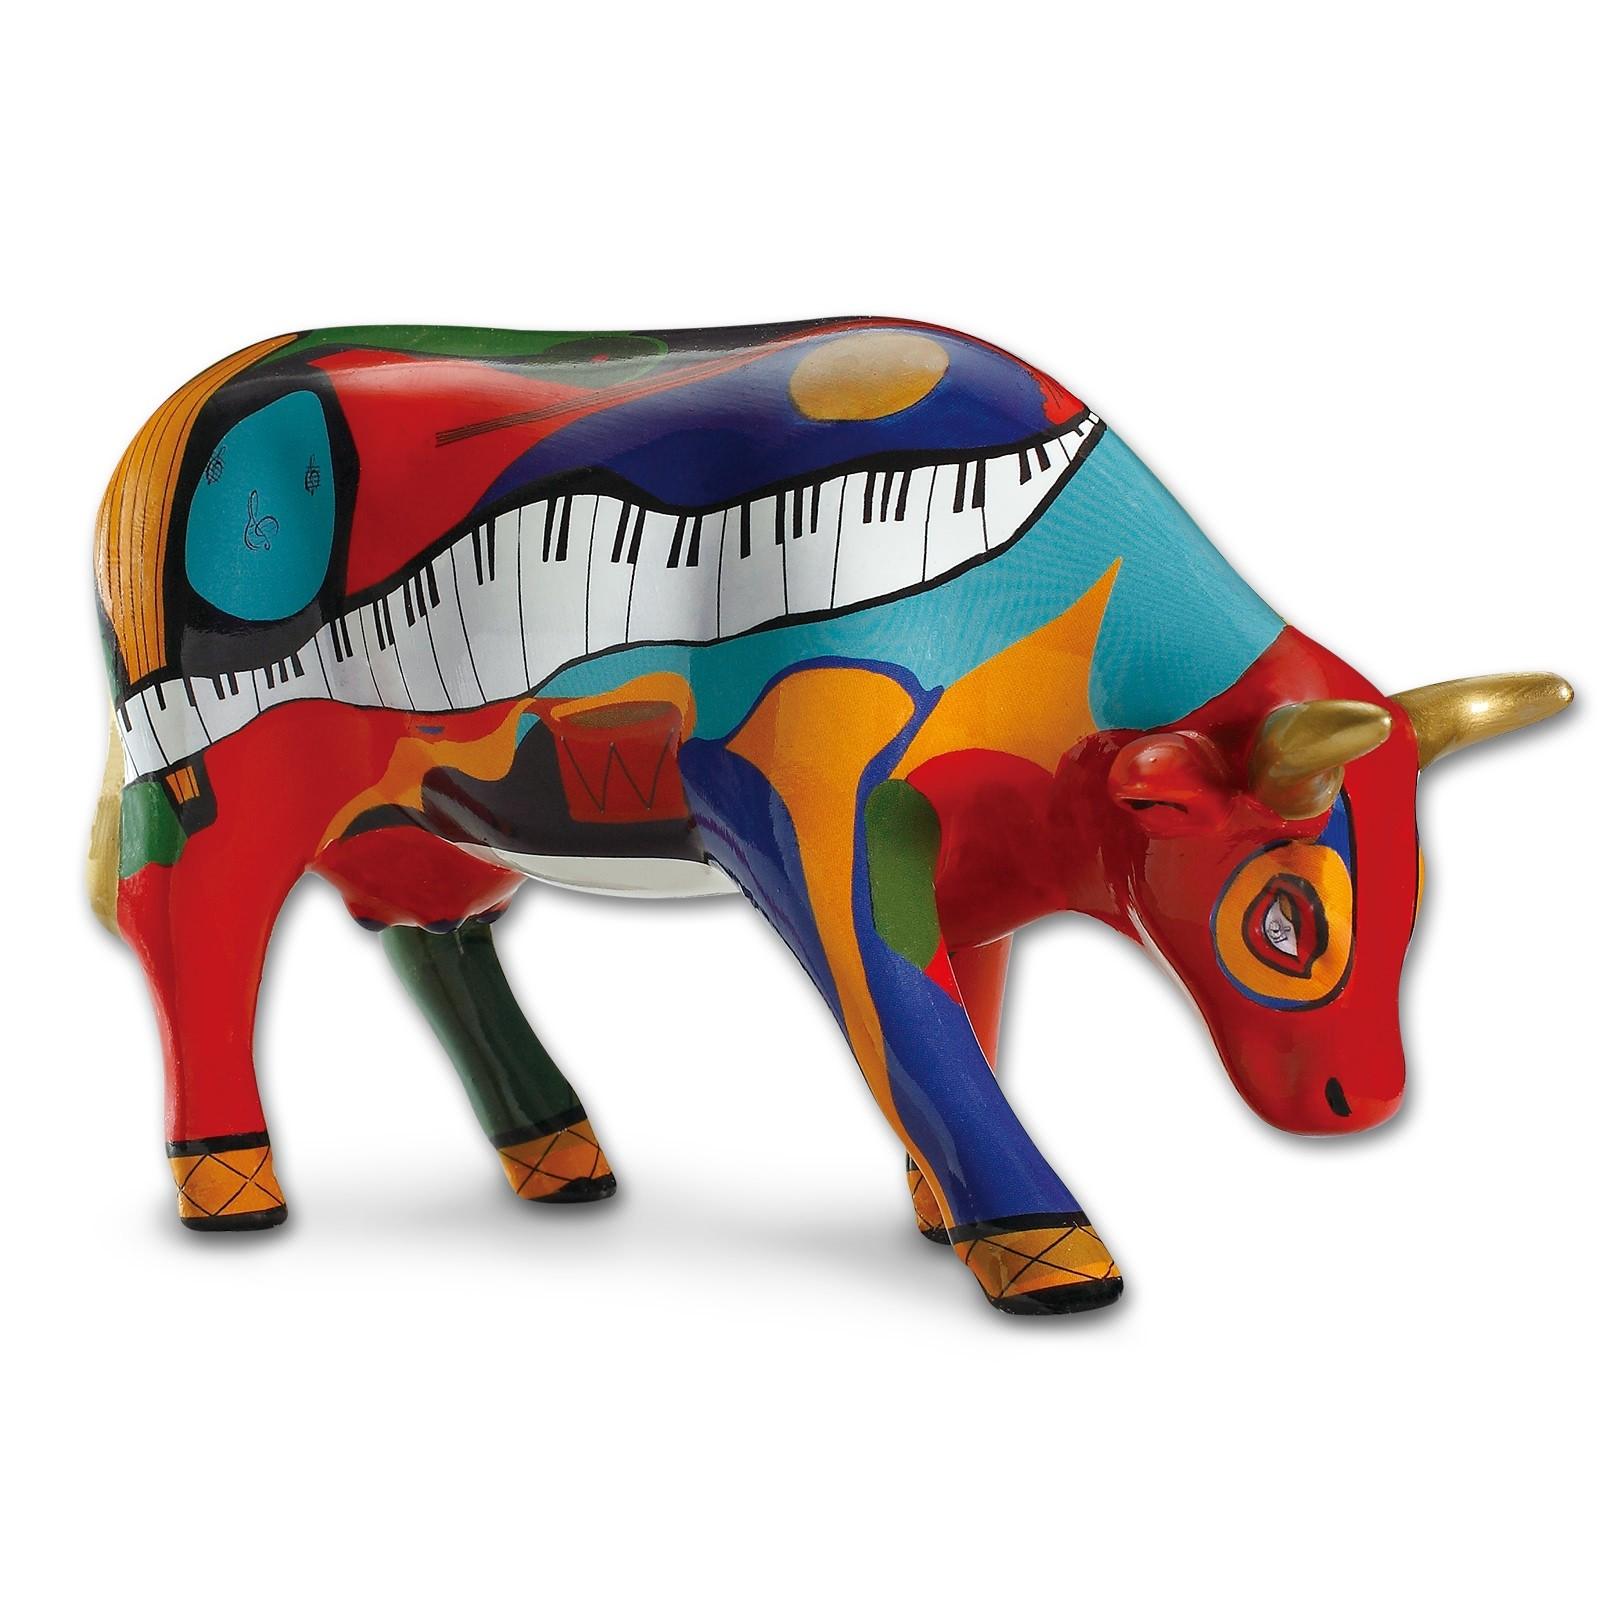 Design Kuh mit verschiedenen Instrumenten 10cm Köthen Kuhparade KOS104